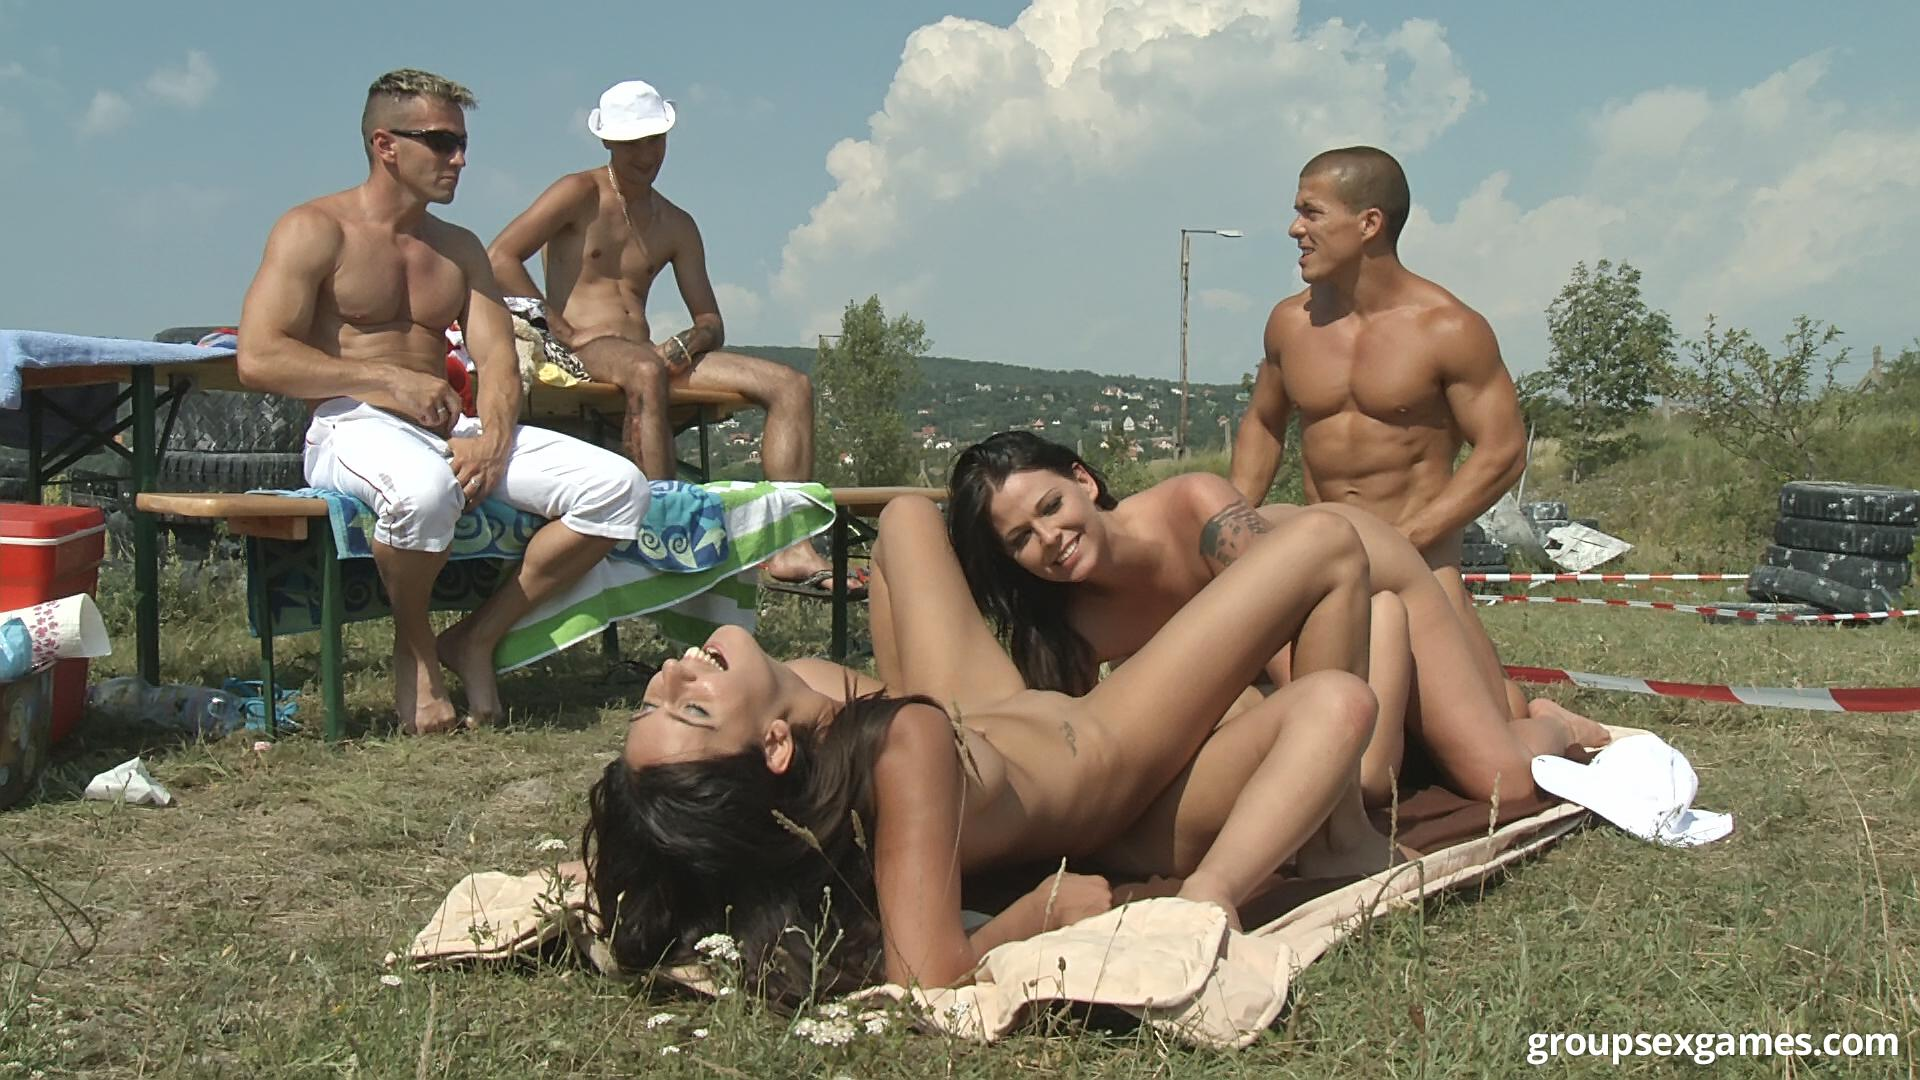 Orgy galleries